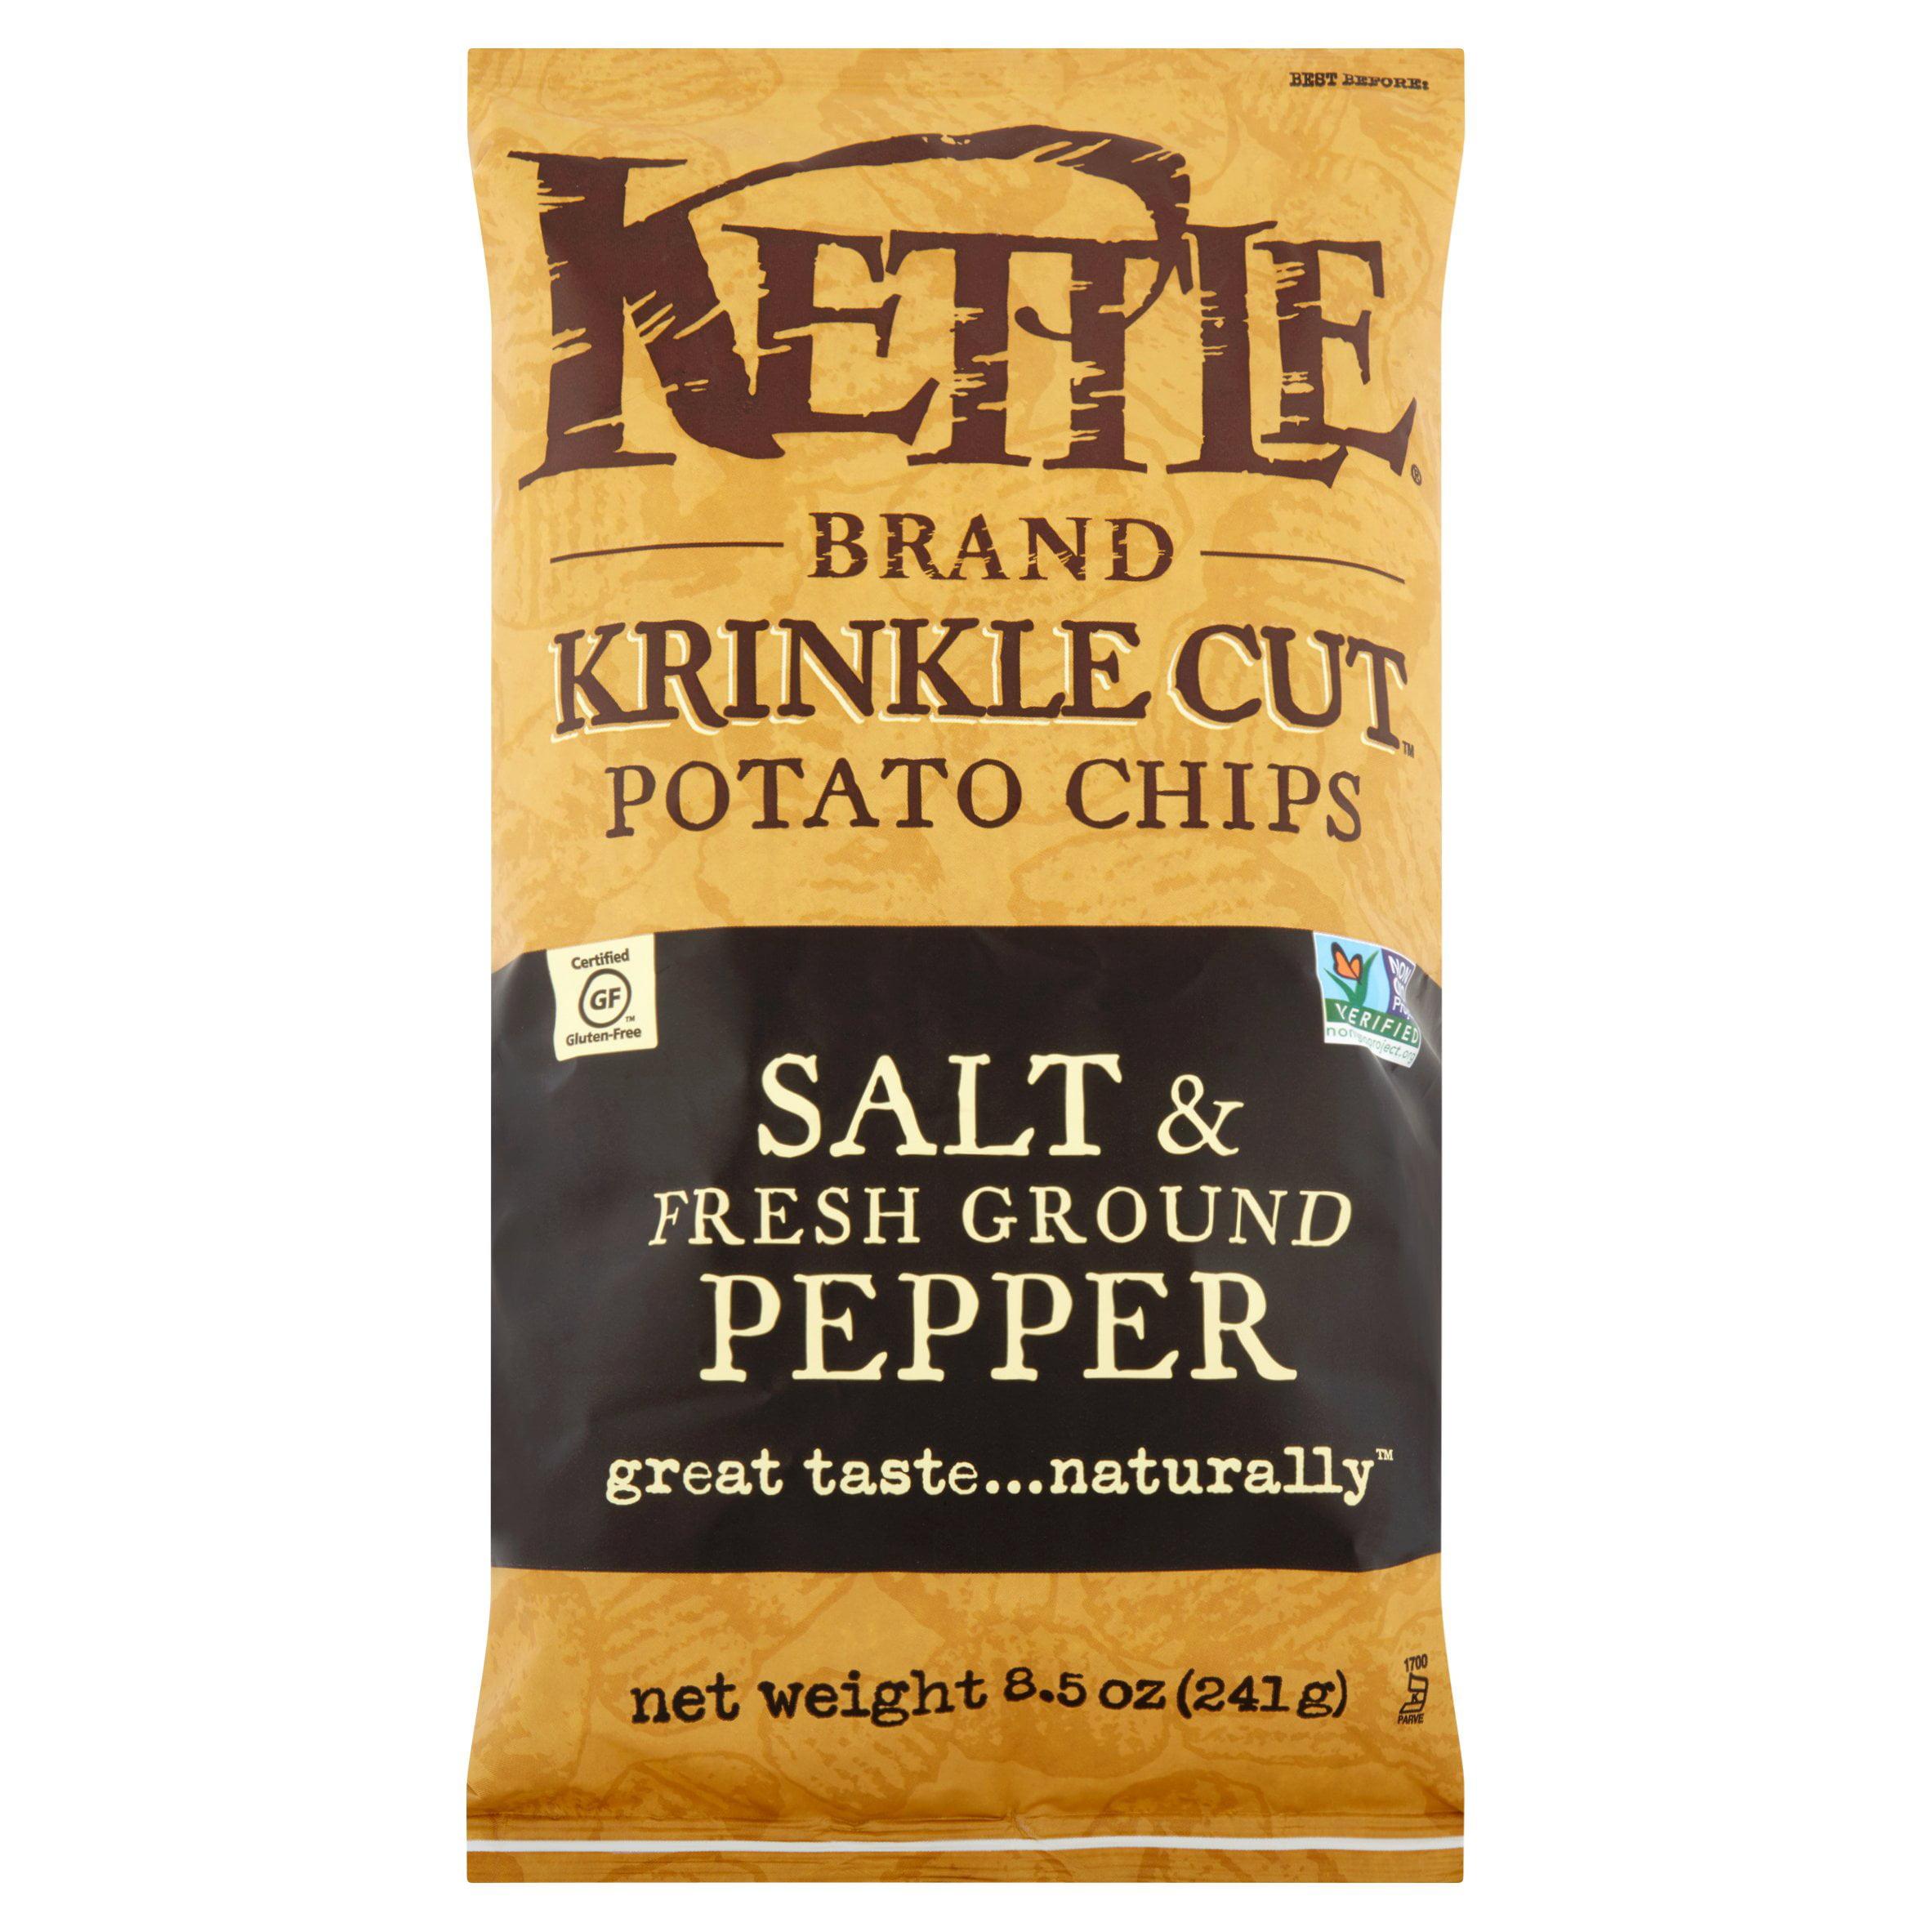 Kettle Brand Krinkle Cut Potato Chips Salt & Fresh Ground Pepper, 8.5 OZ by Kettle Food, Inc.